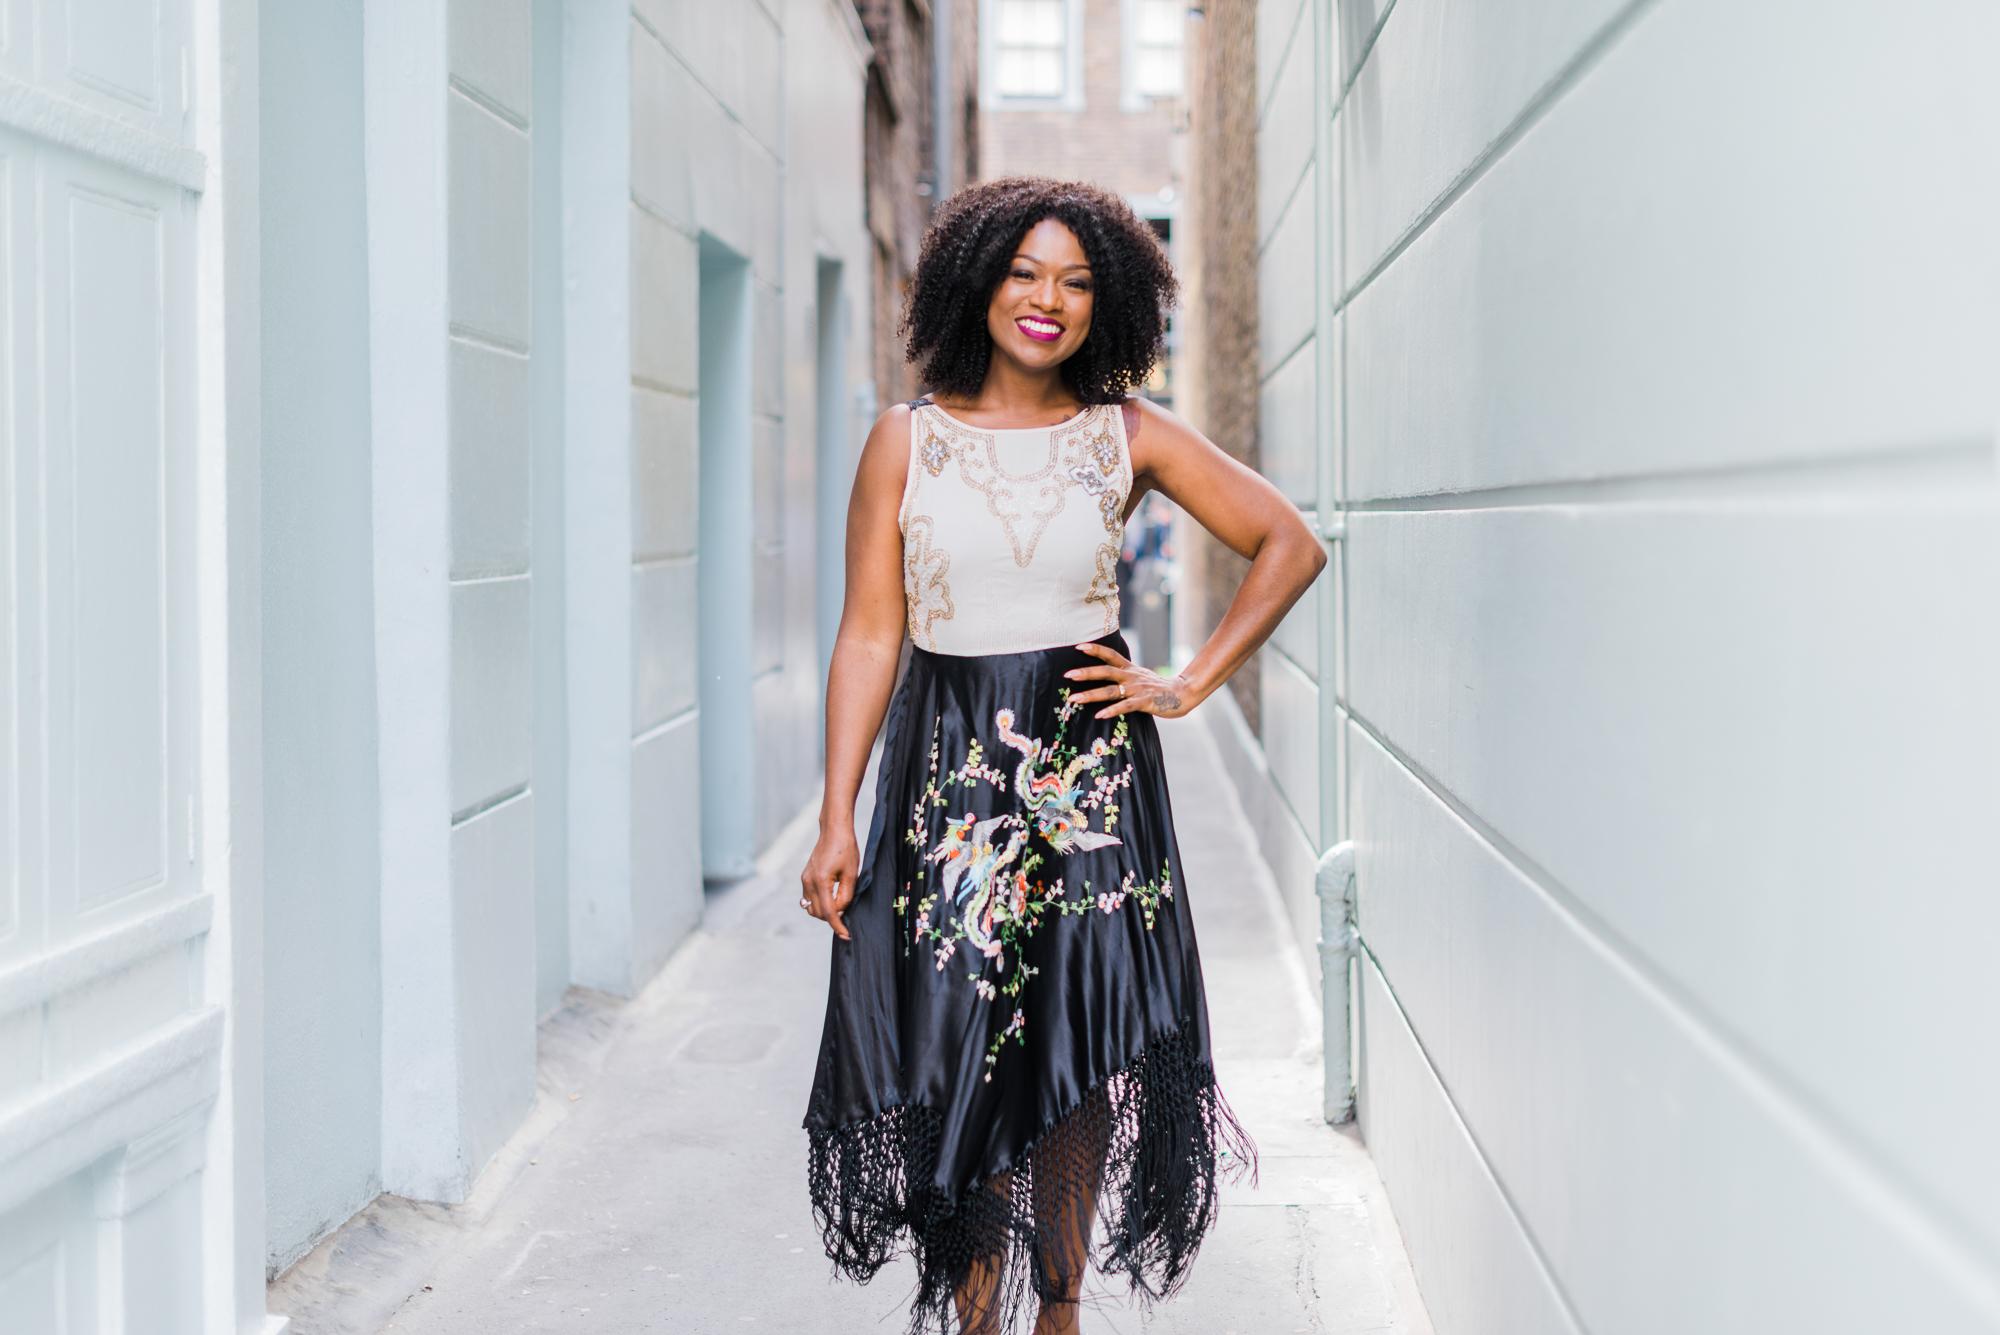 Joyce Oladipo Becky Rui Personal Branding Photographer-014.jpg